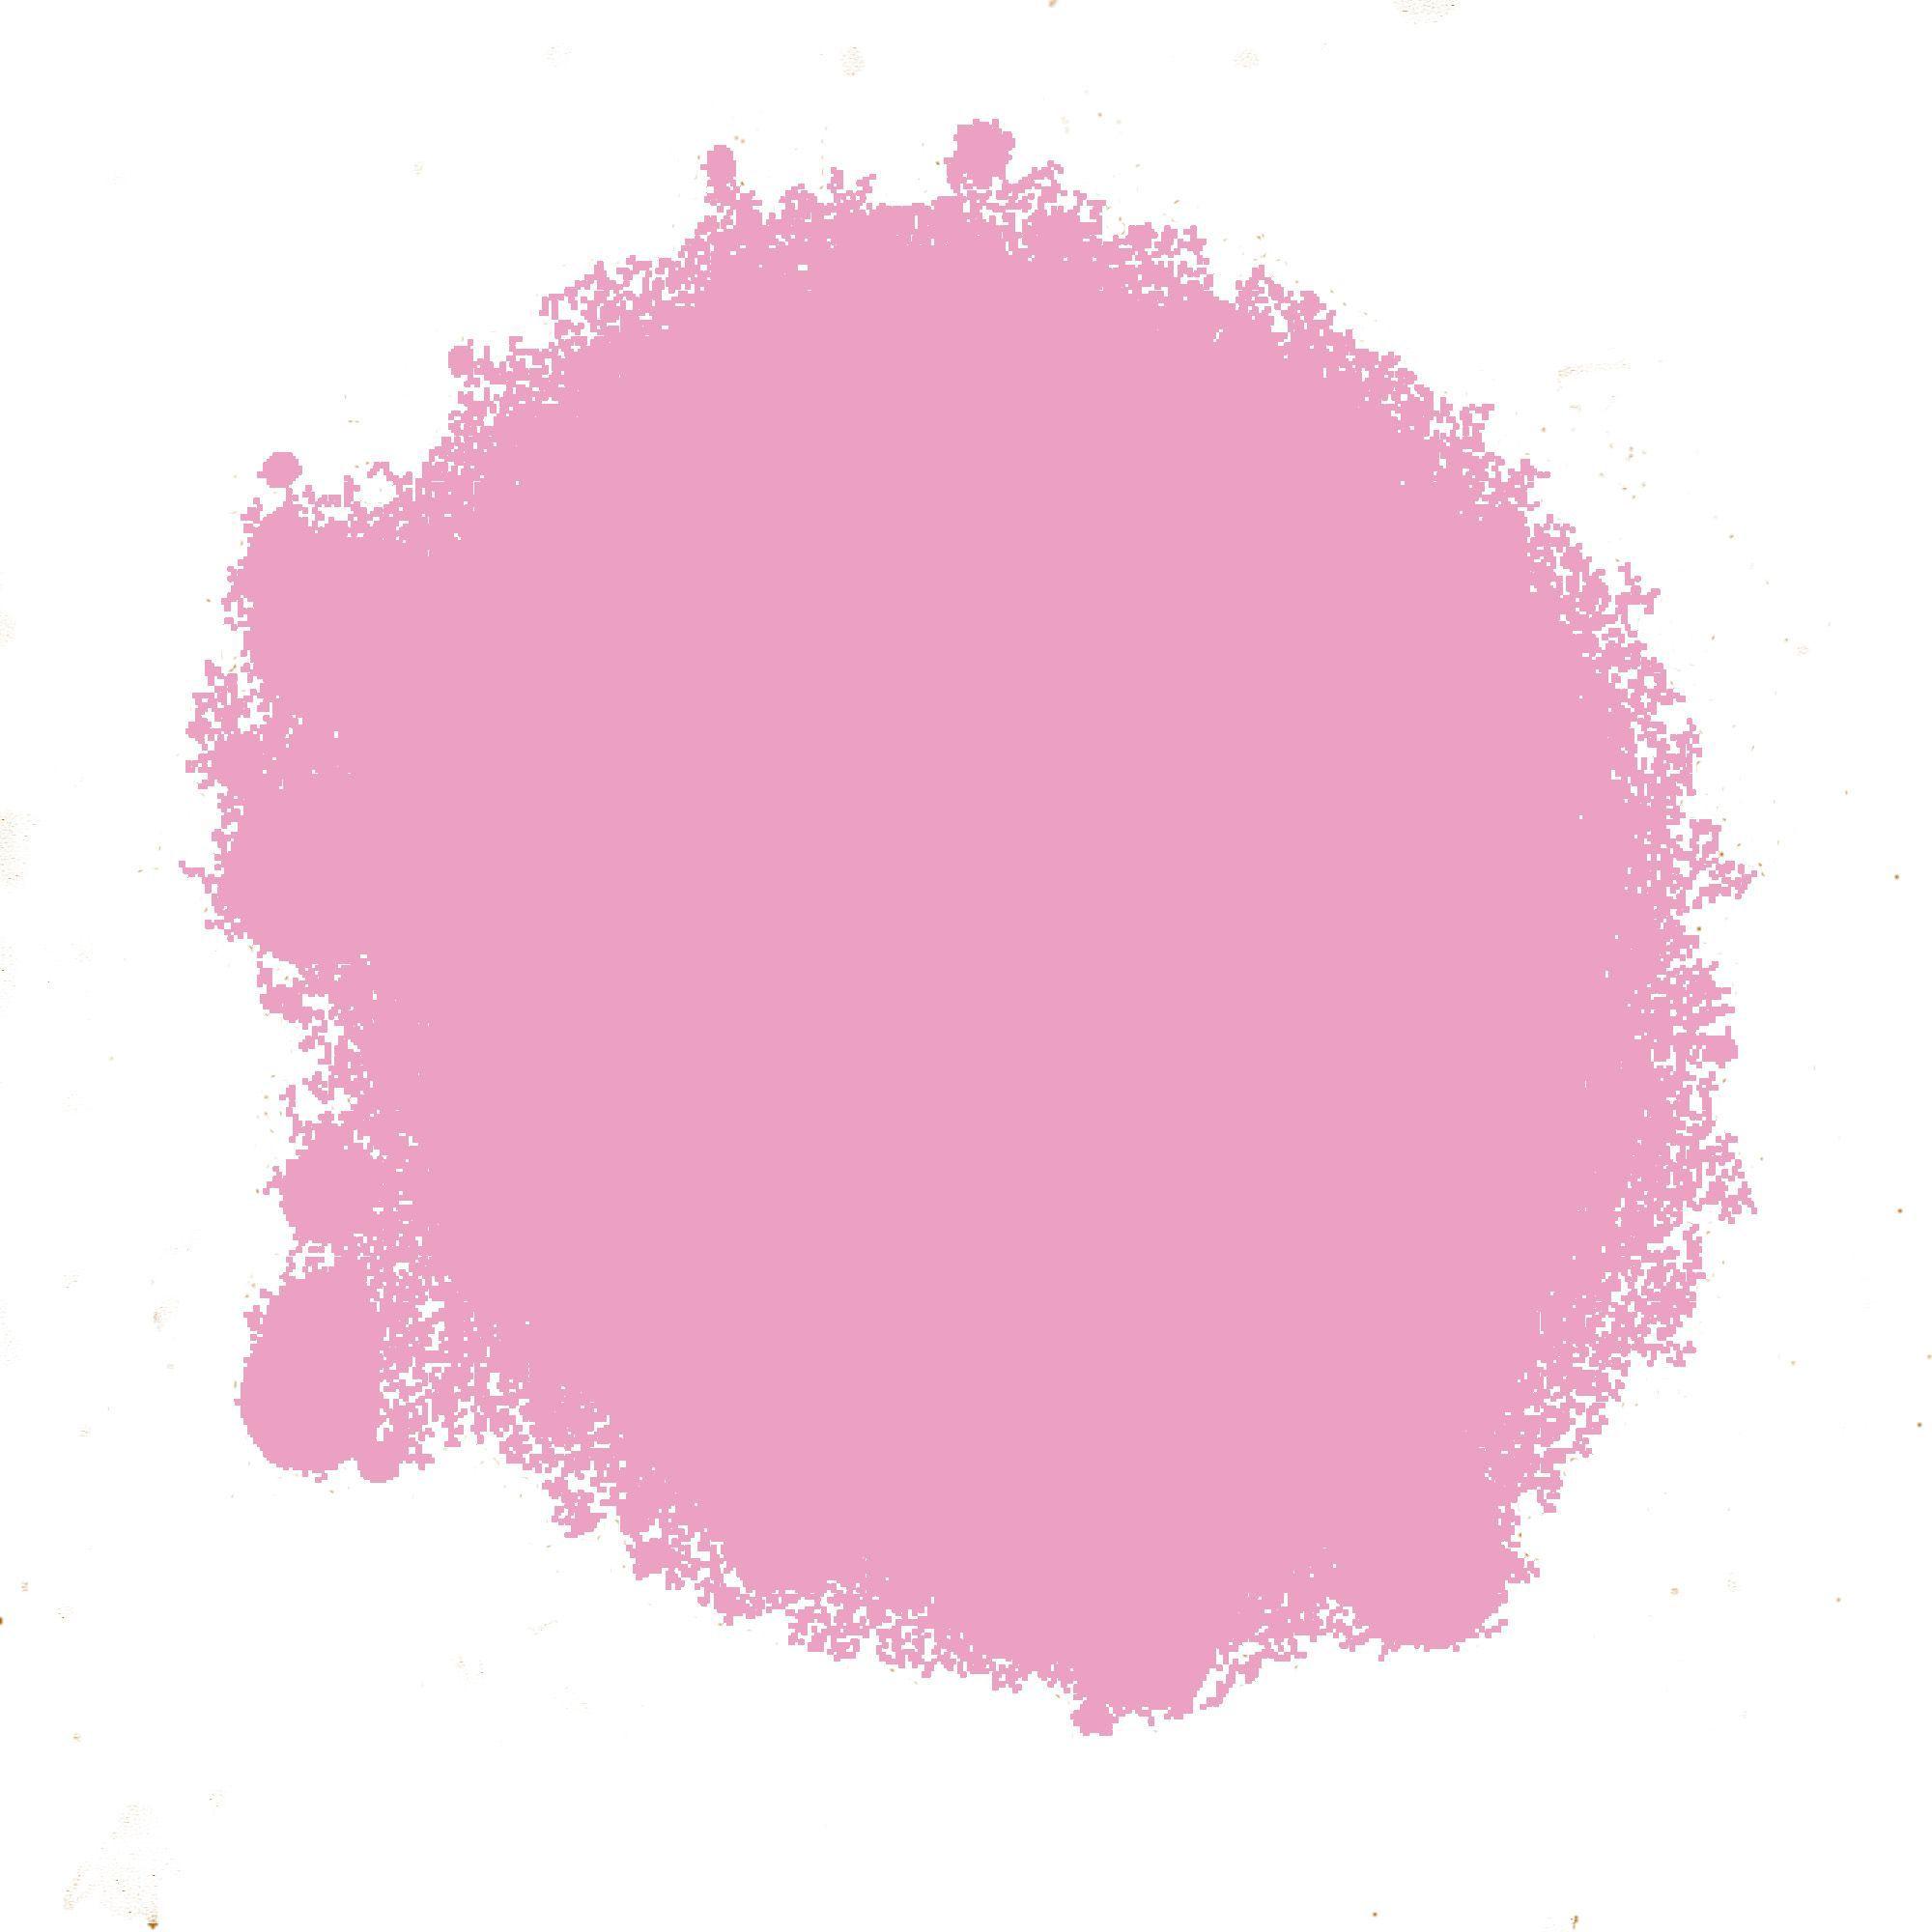 Plasti-Kote Hot Pink Gloss Enamel Spray Paint 100 Ml